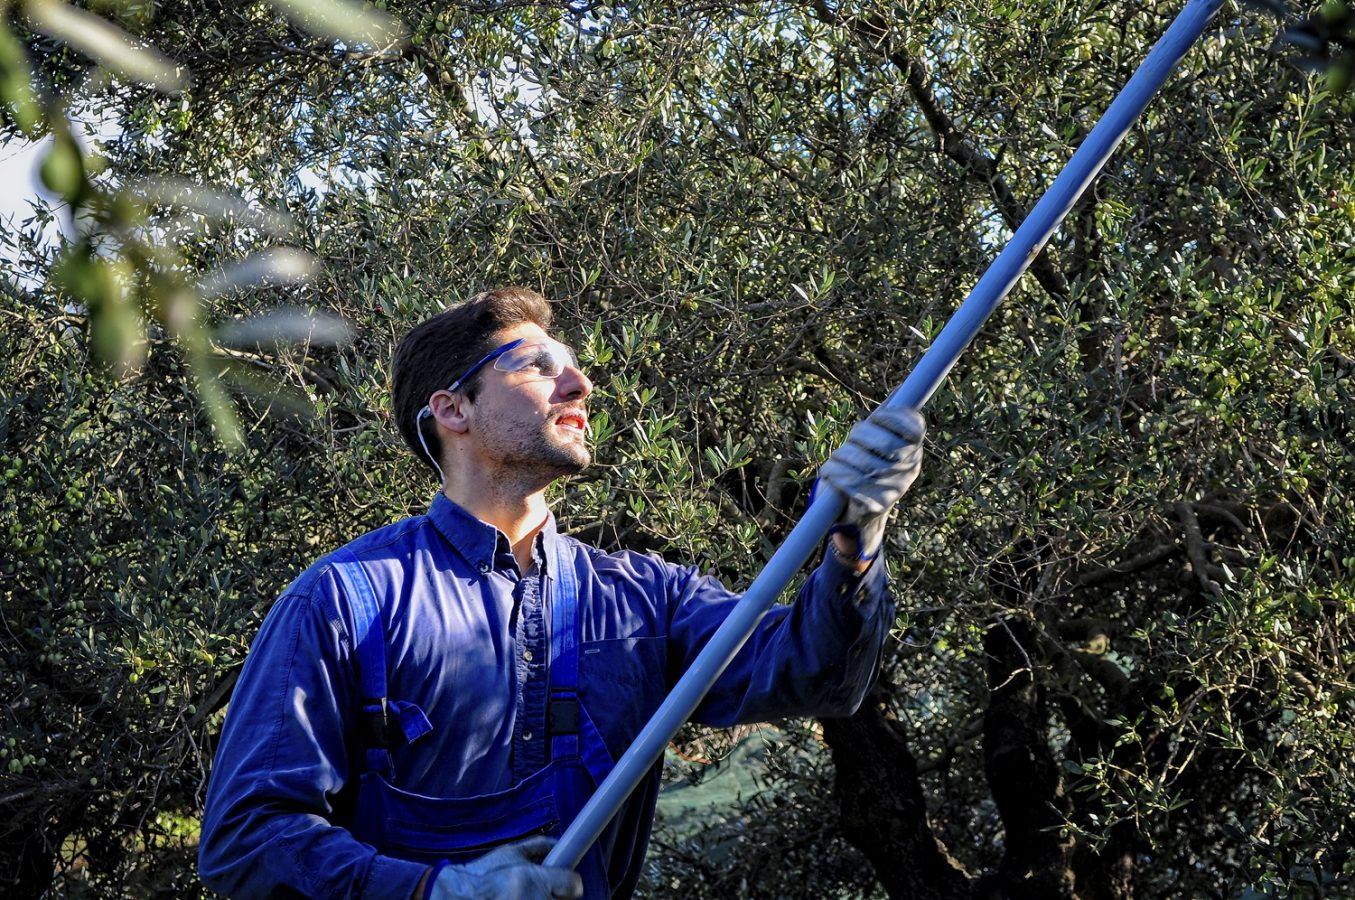 A Cretan man harvesting prime olives from trees outside Galatas Village